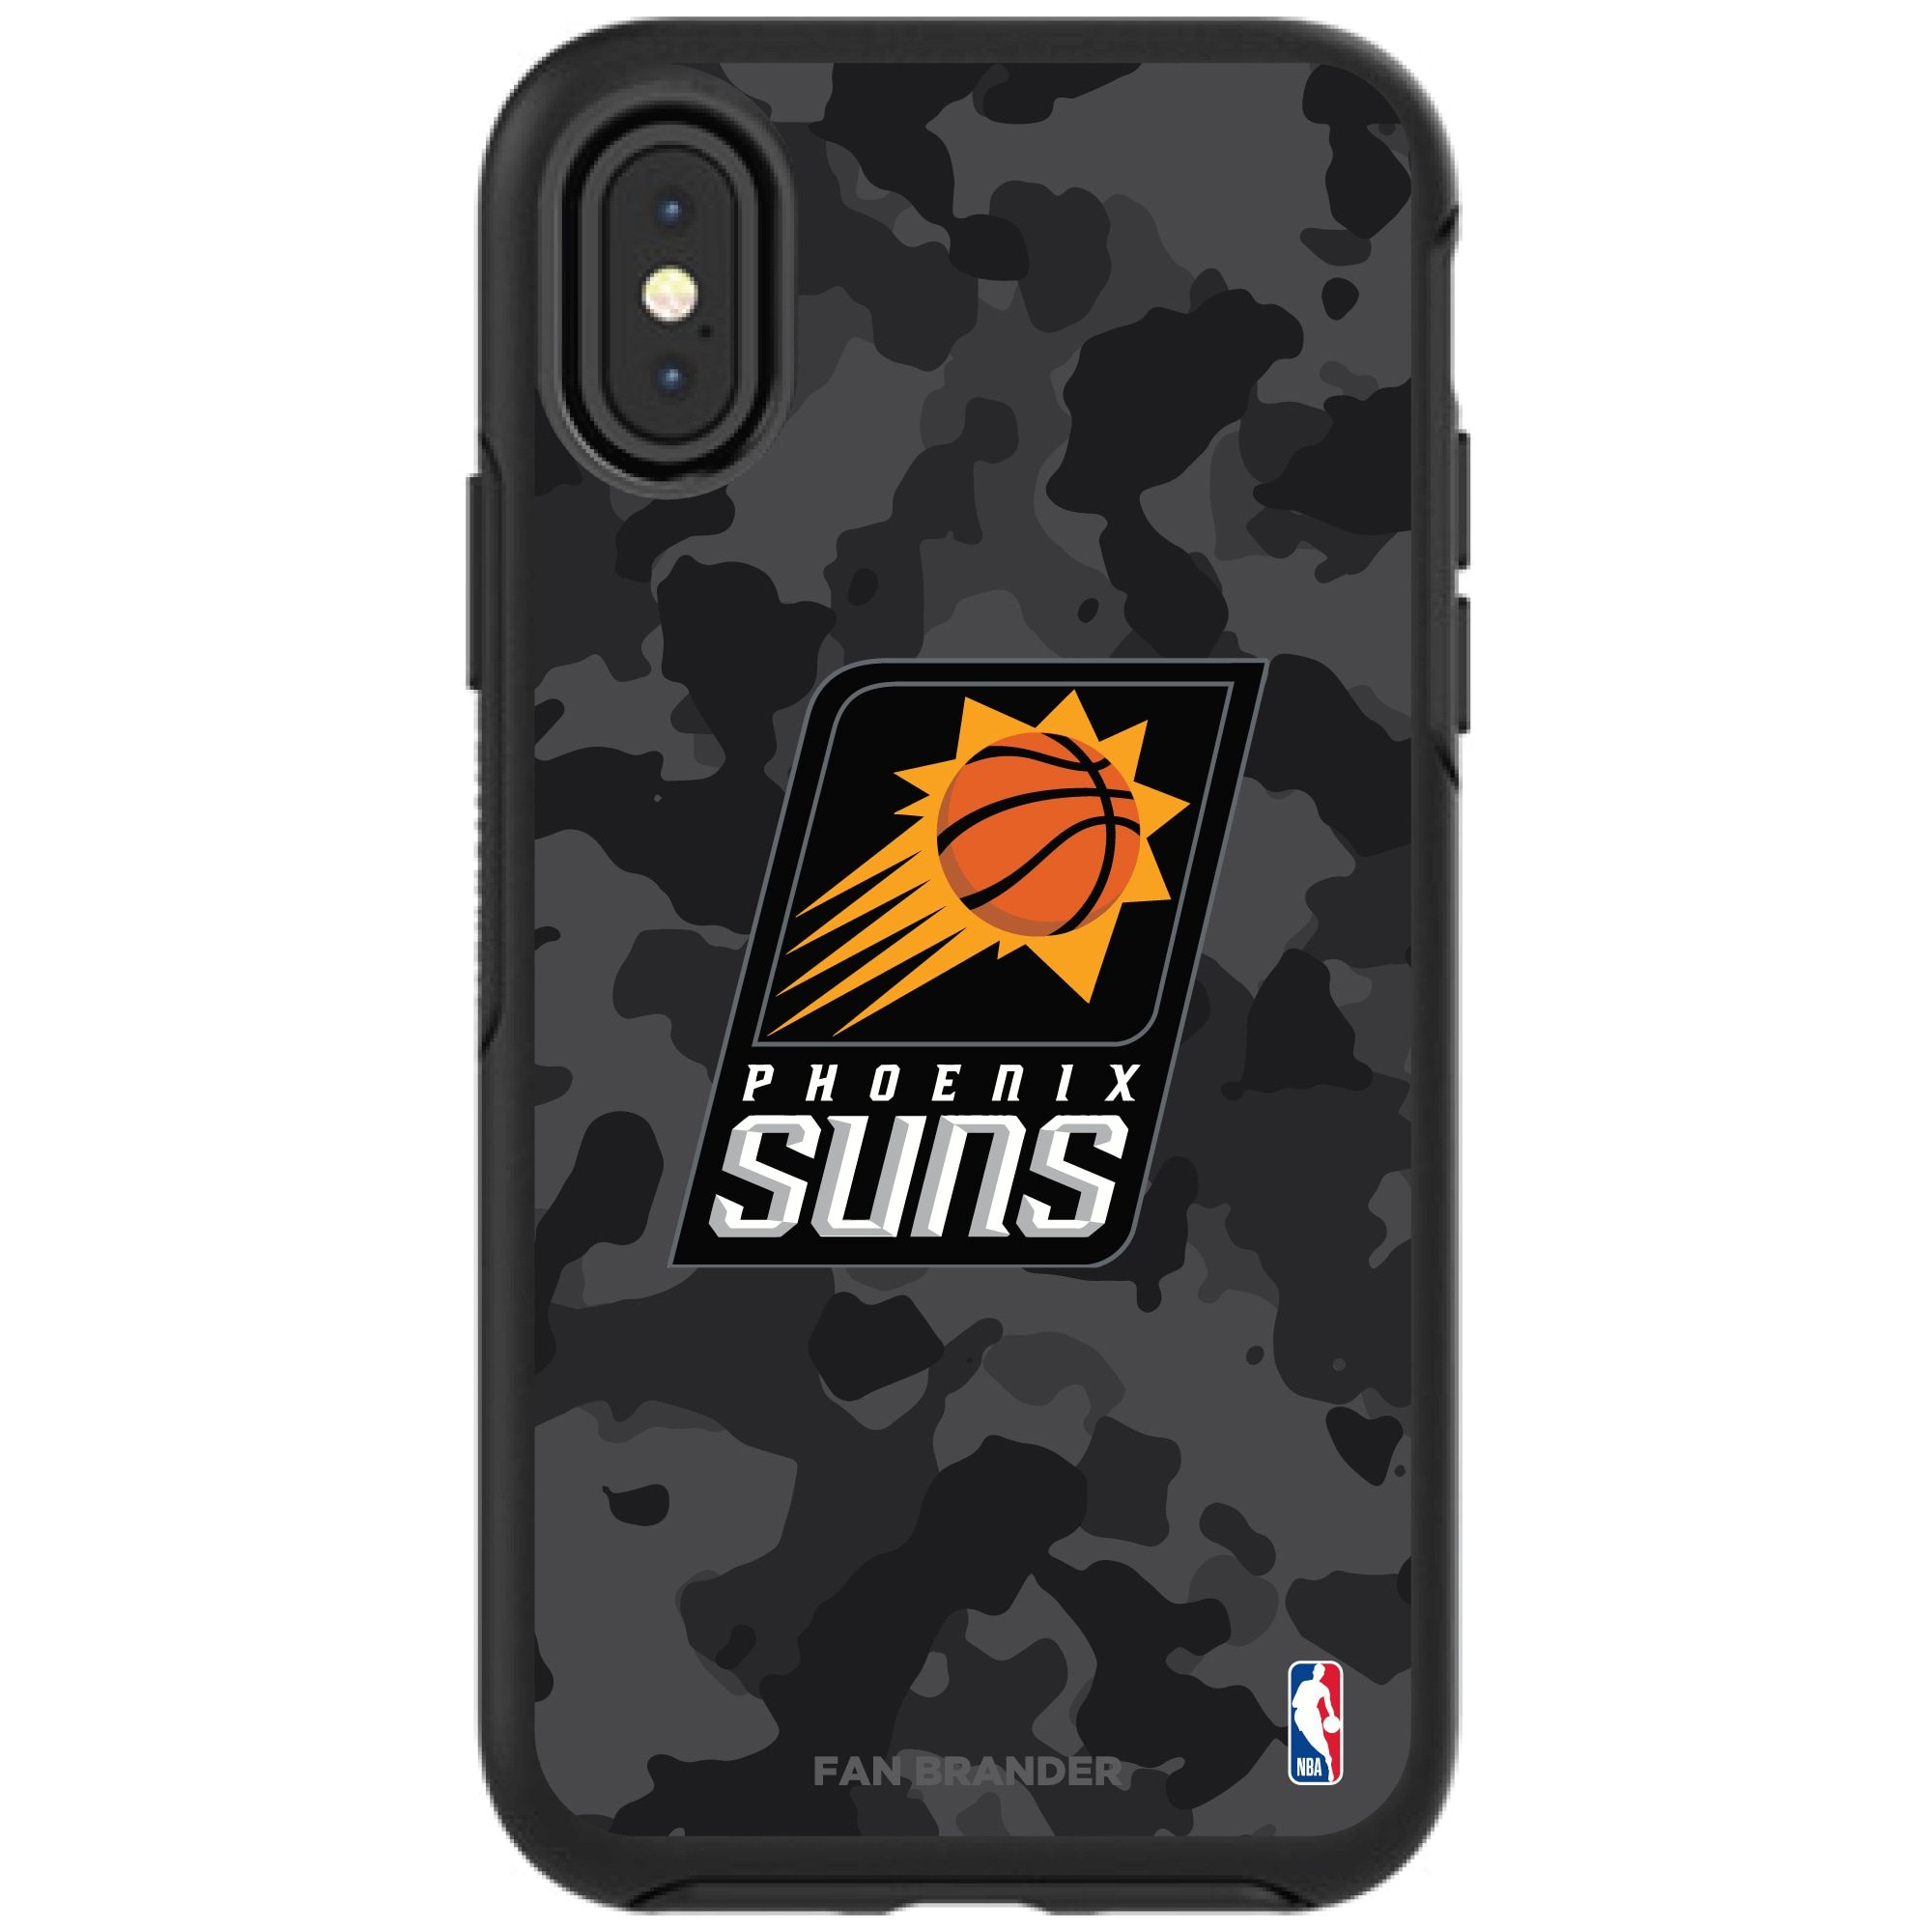 Phoenix Suns OtterBox Urban Camo iPhone Case